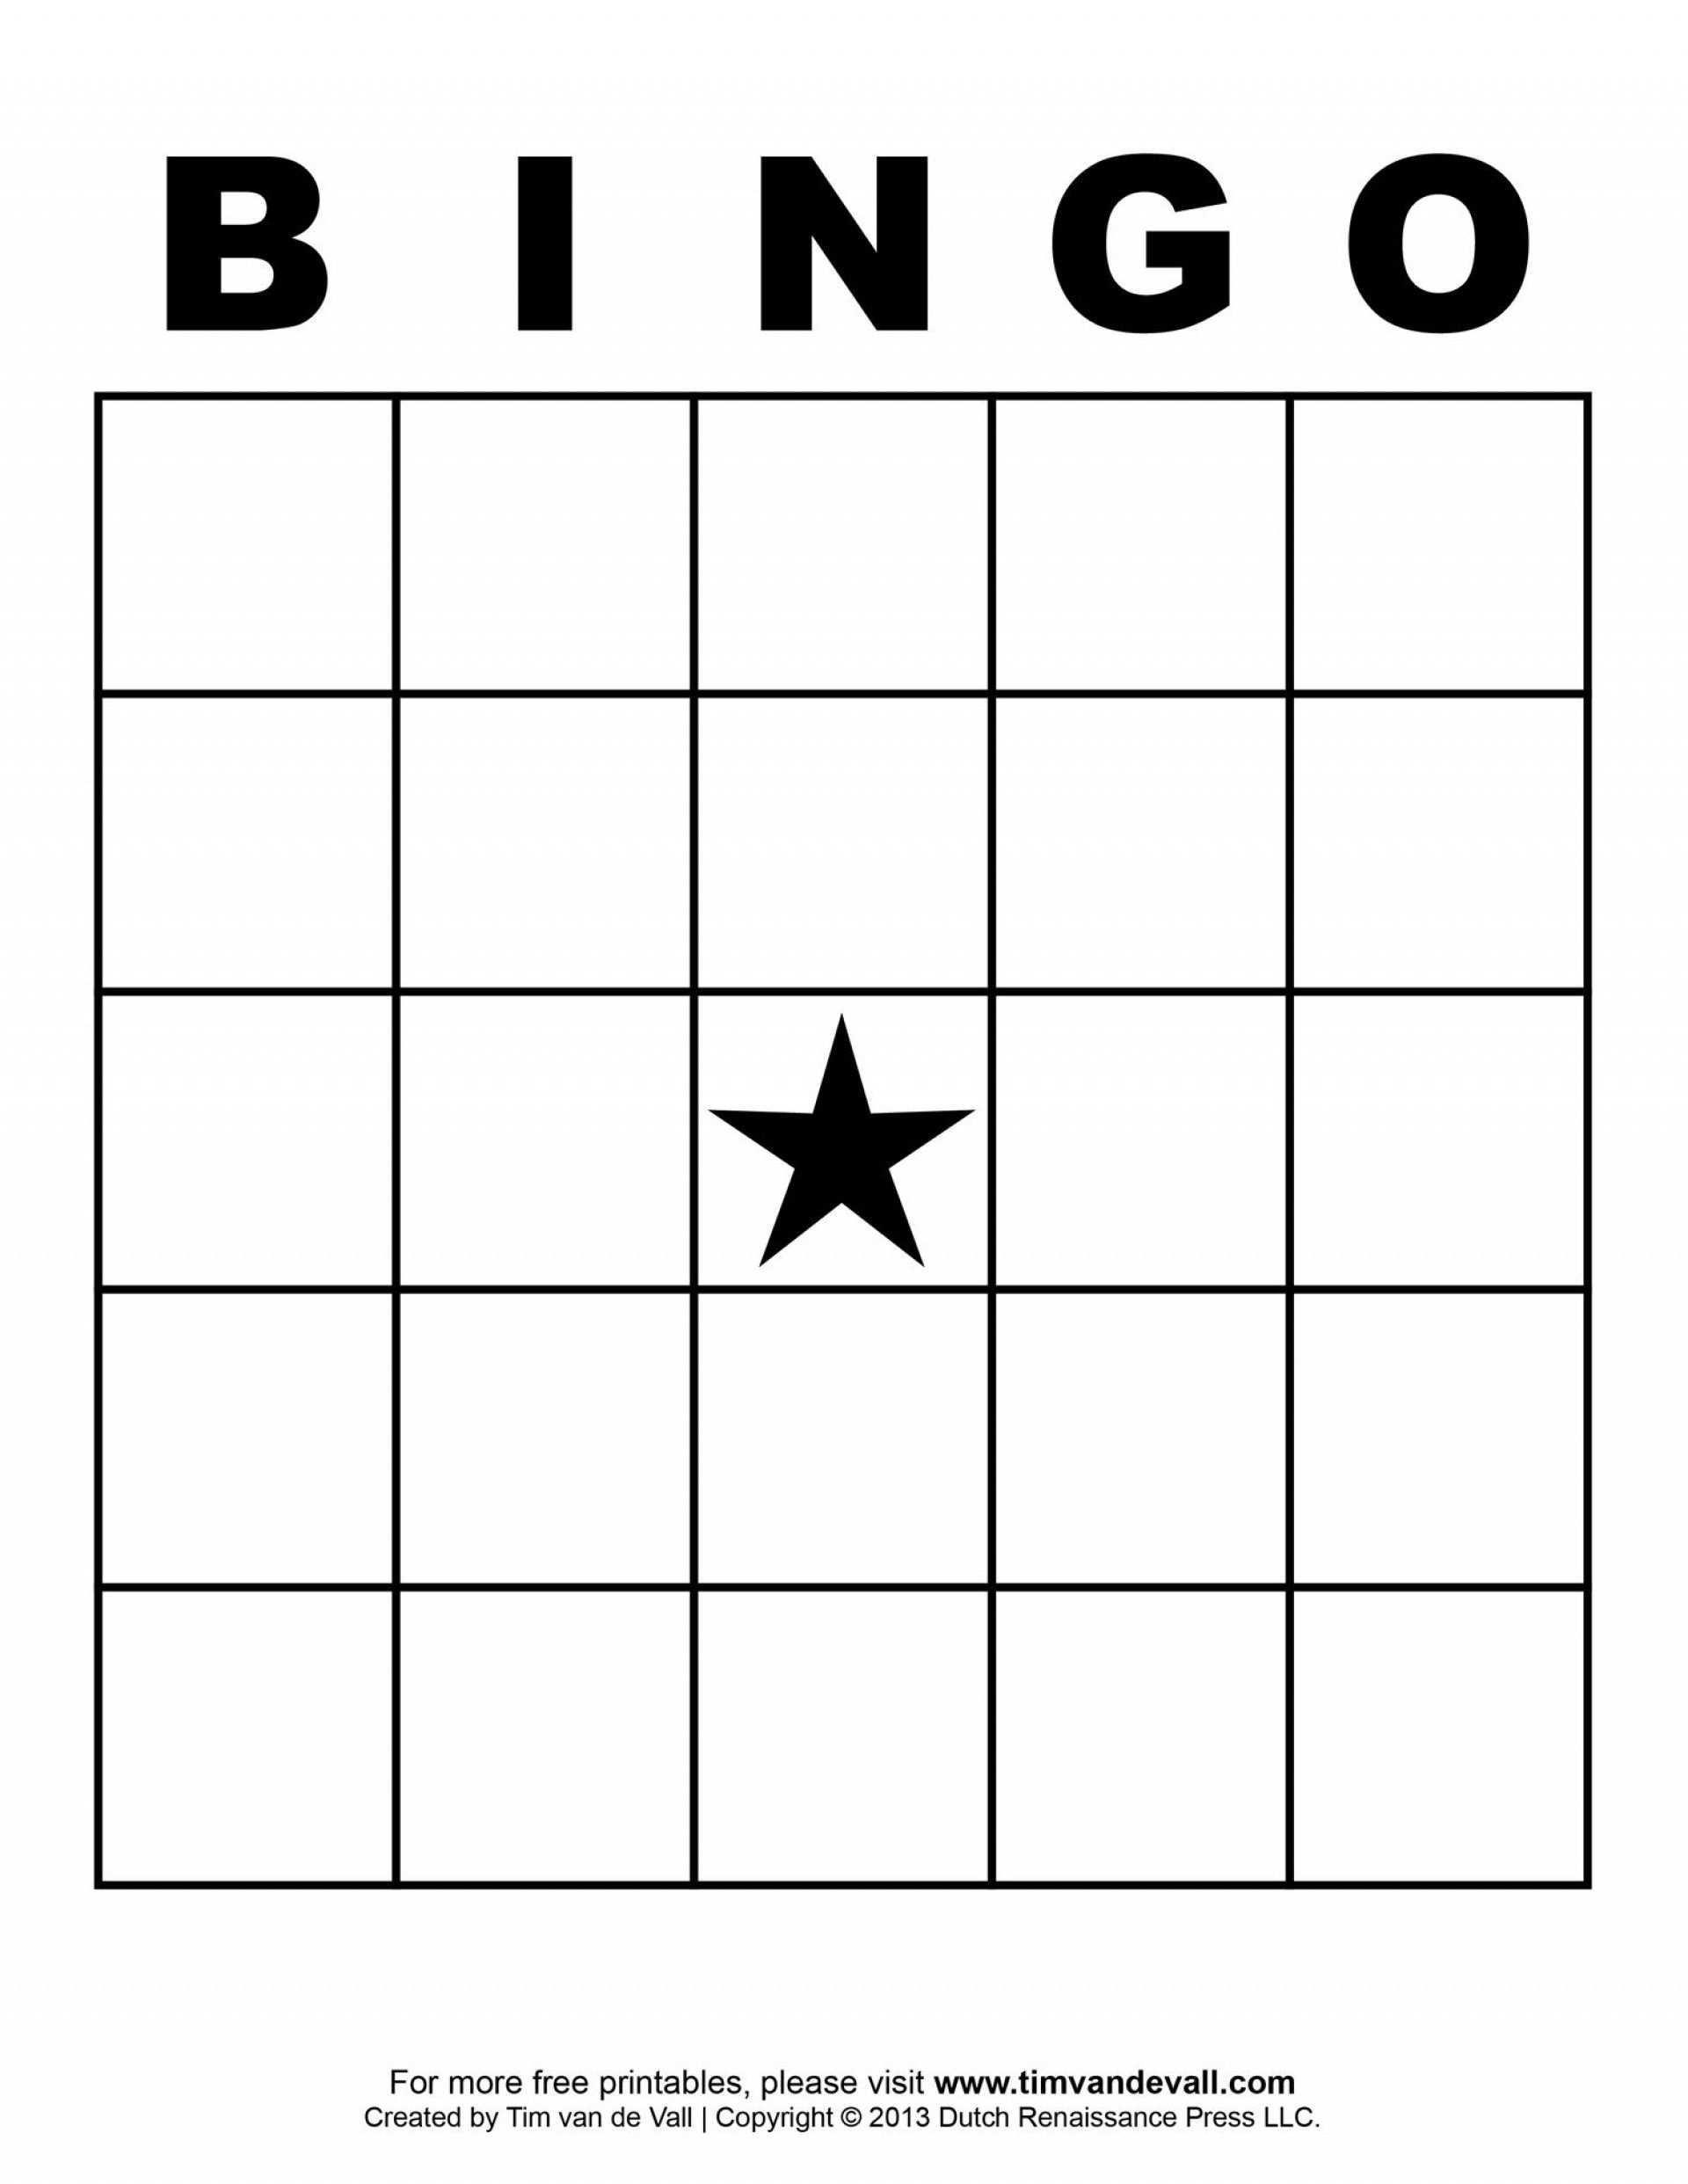 034 Template Ideas Blank Bingo Card Stirring 4x4 Excel Regarding Blank Bingo Card Template Mi Free Printable Bingo Cards Free Bingo Cards Bingo Cards Printable